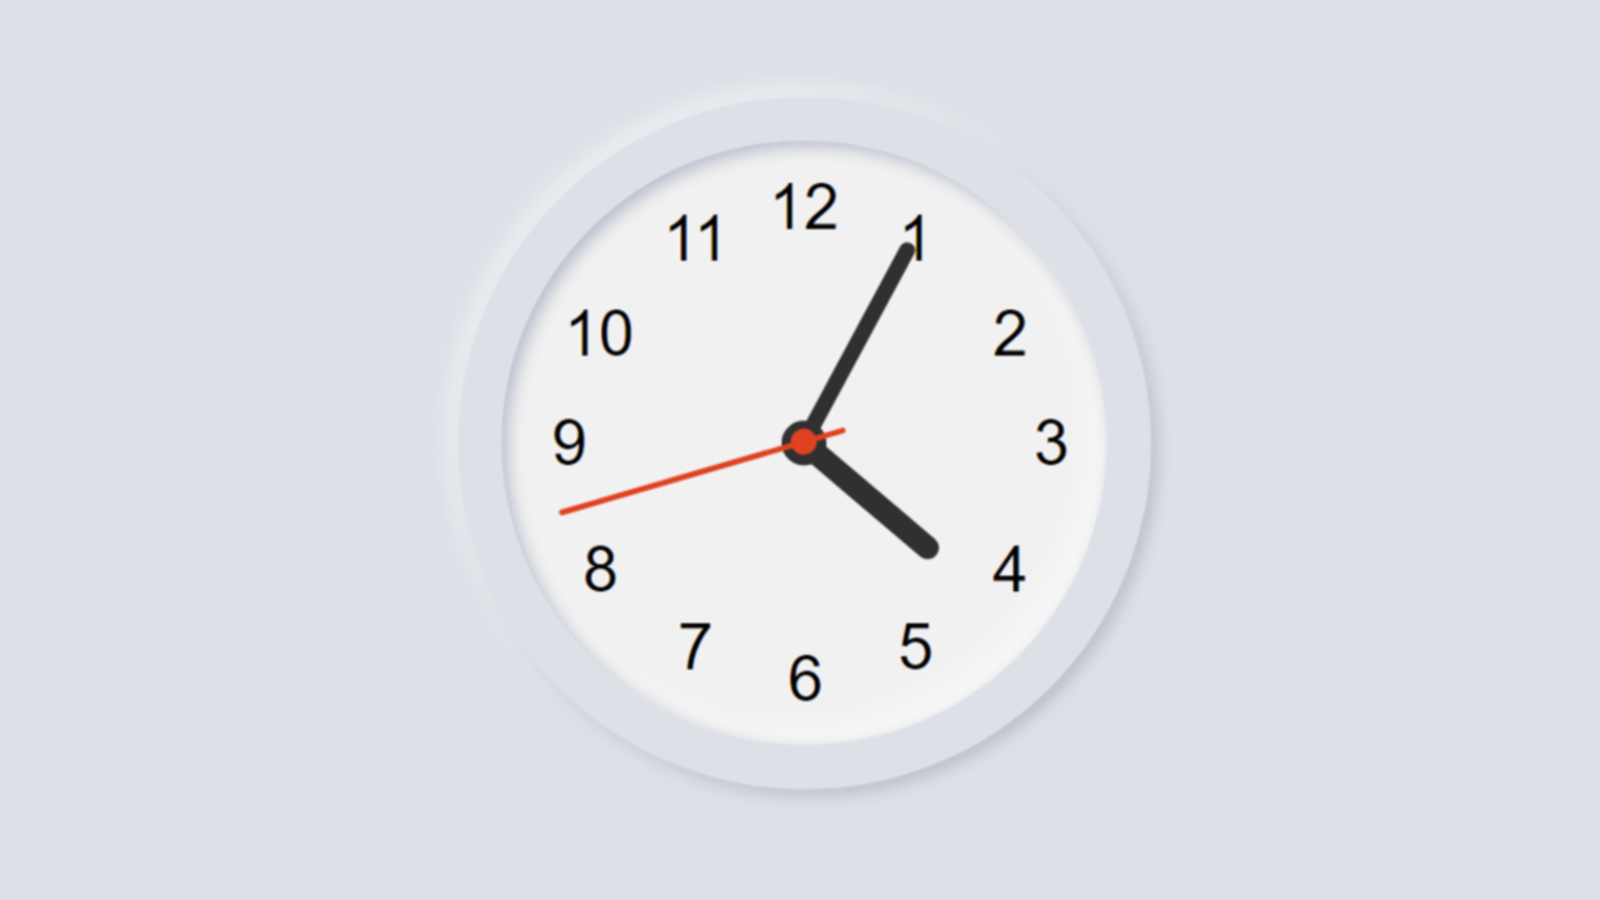 Create an Analog Clock using HTML, CSS and JavaScript